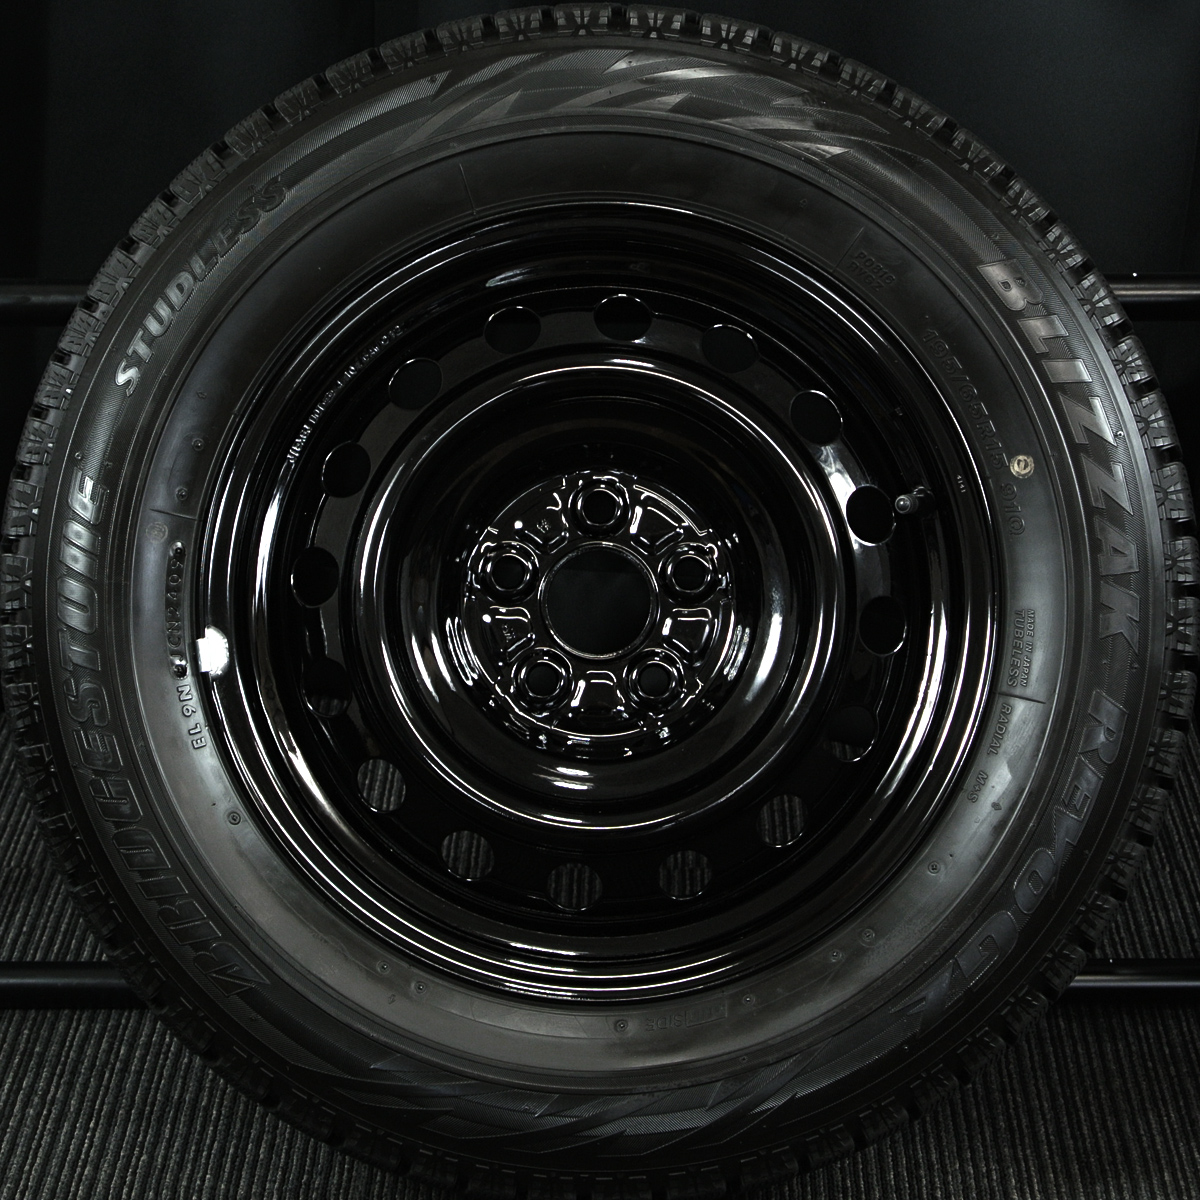 TOYOTA ウィッシュ 純正 ブラック BRIDGESTONE BLIZZAK REVO-GZ 195/65R15 4本SET